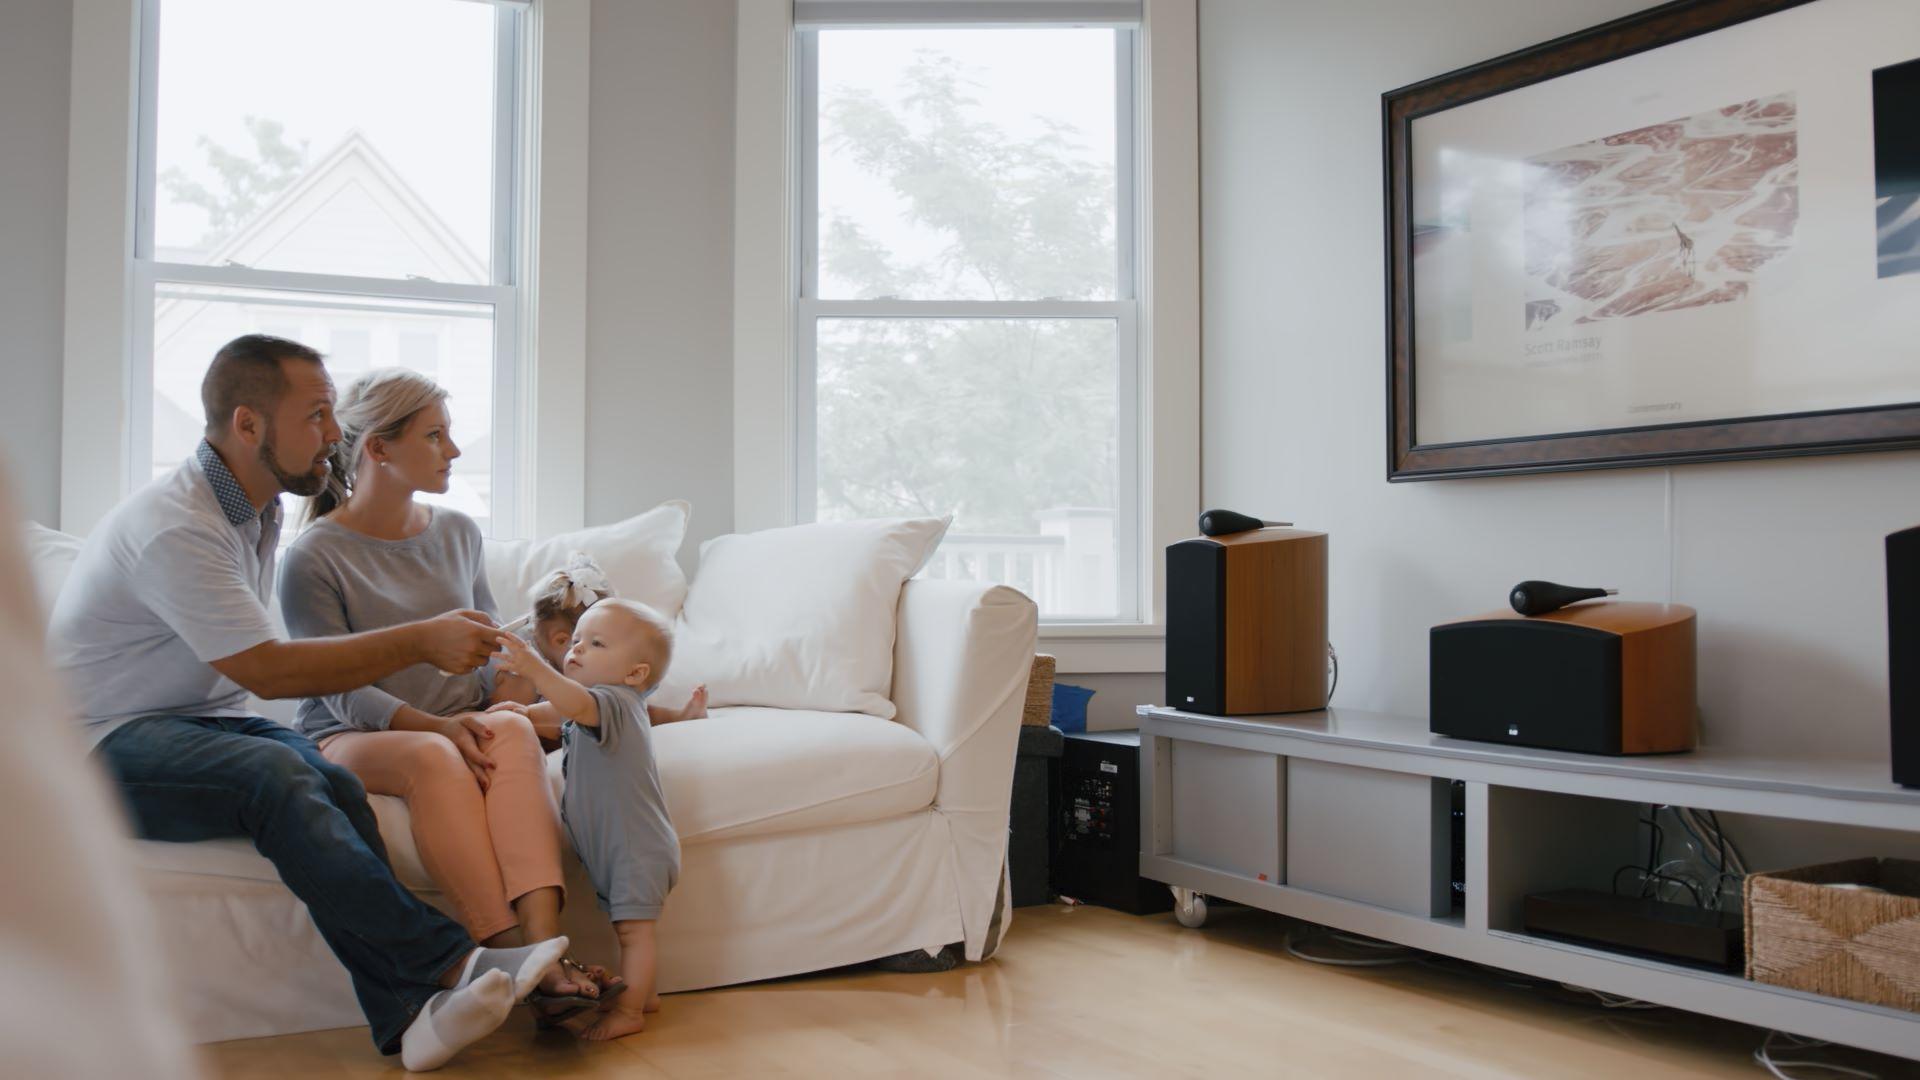 deco tv frames overview